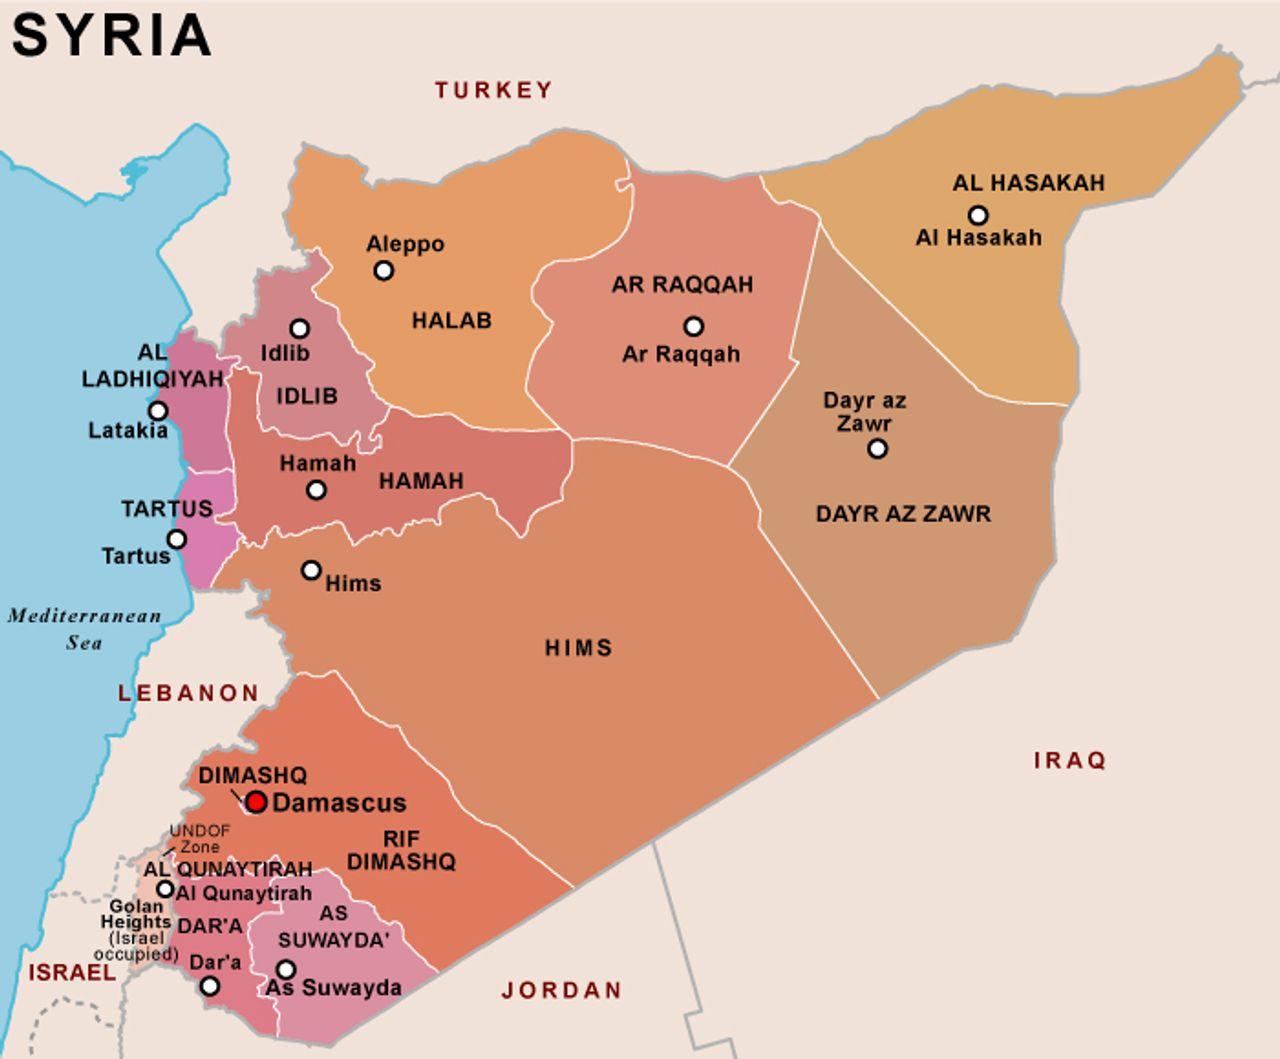 Syria's provinces